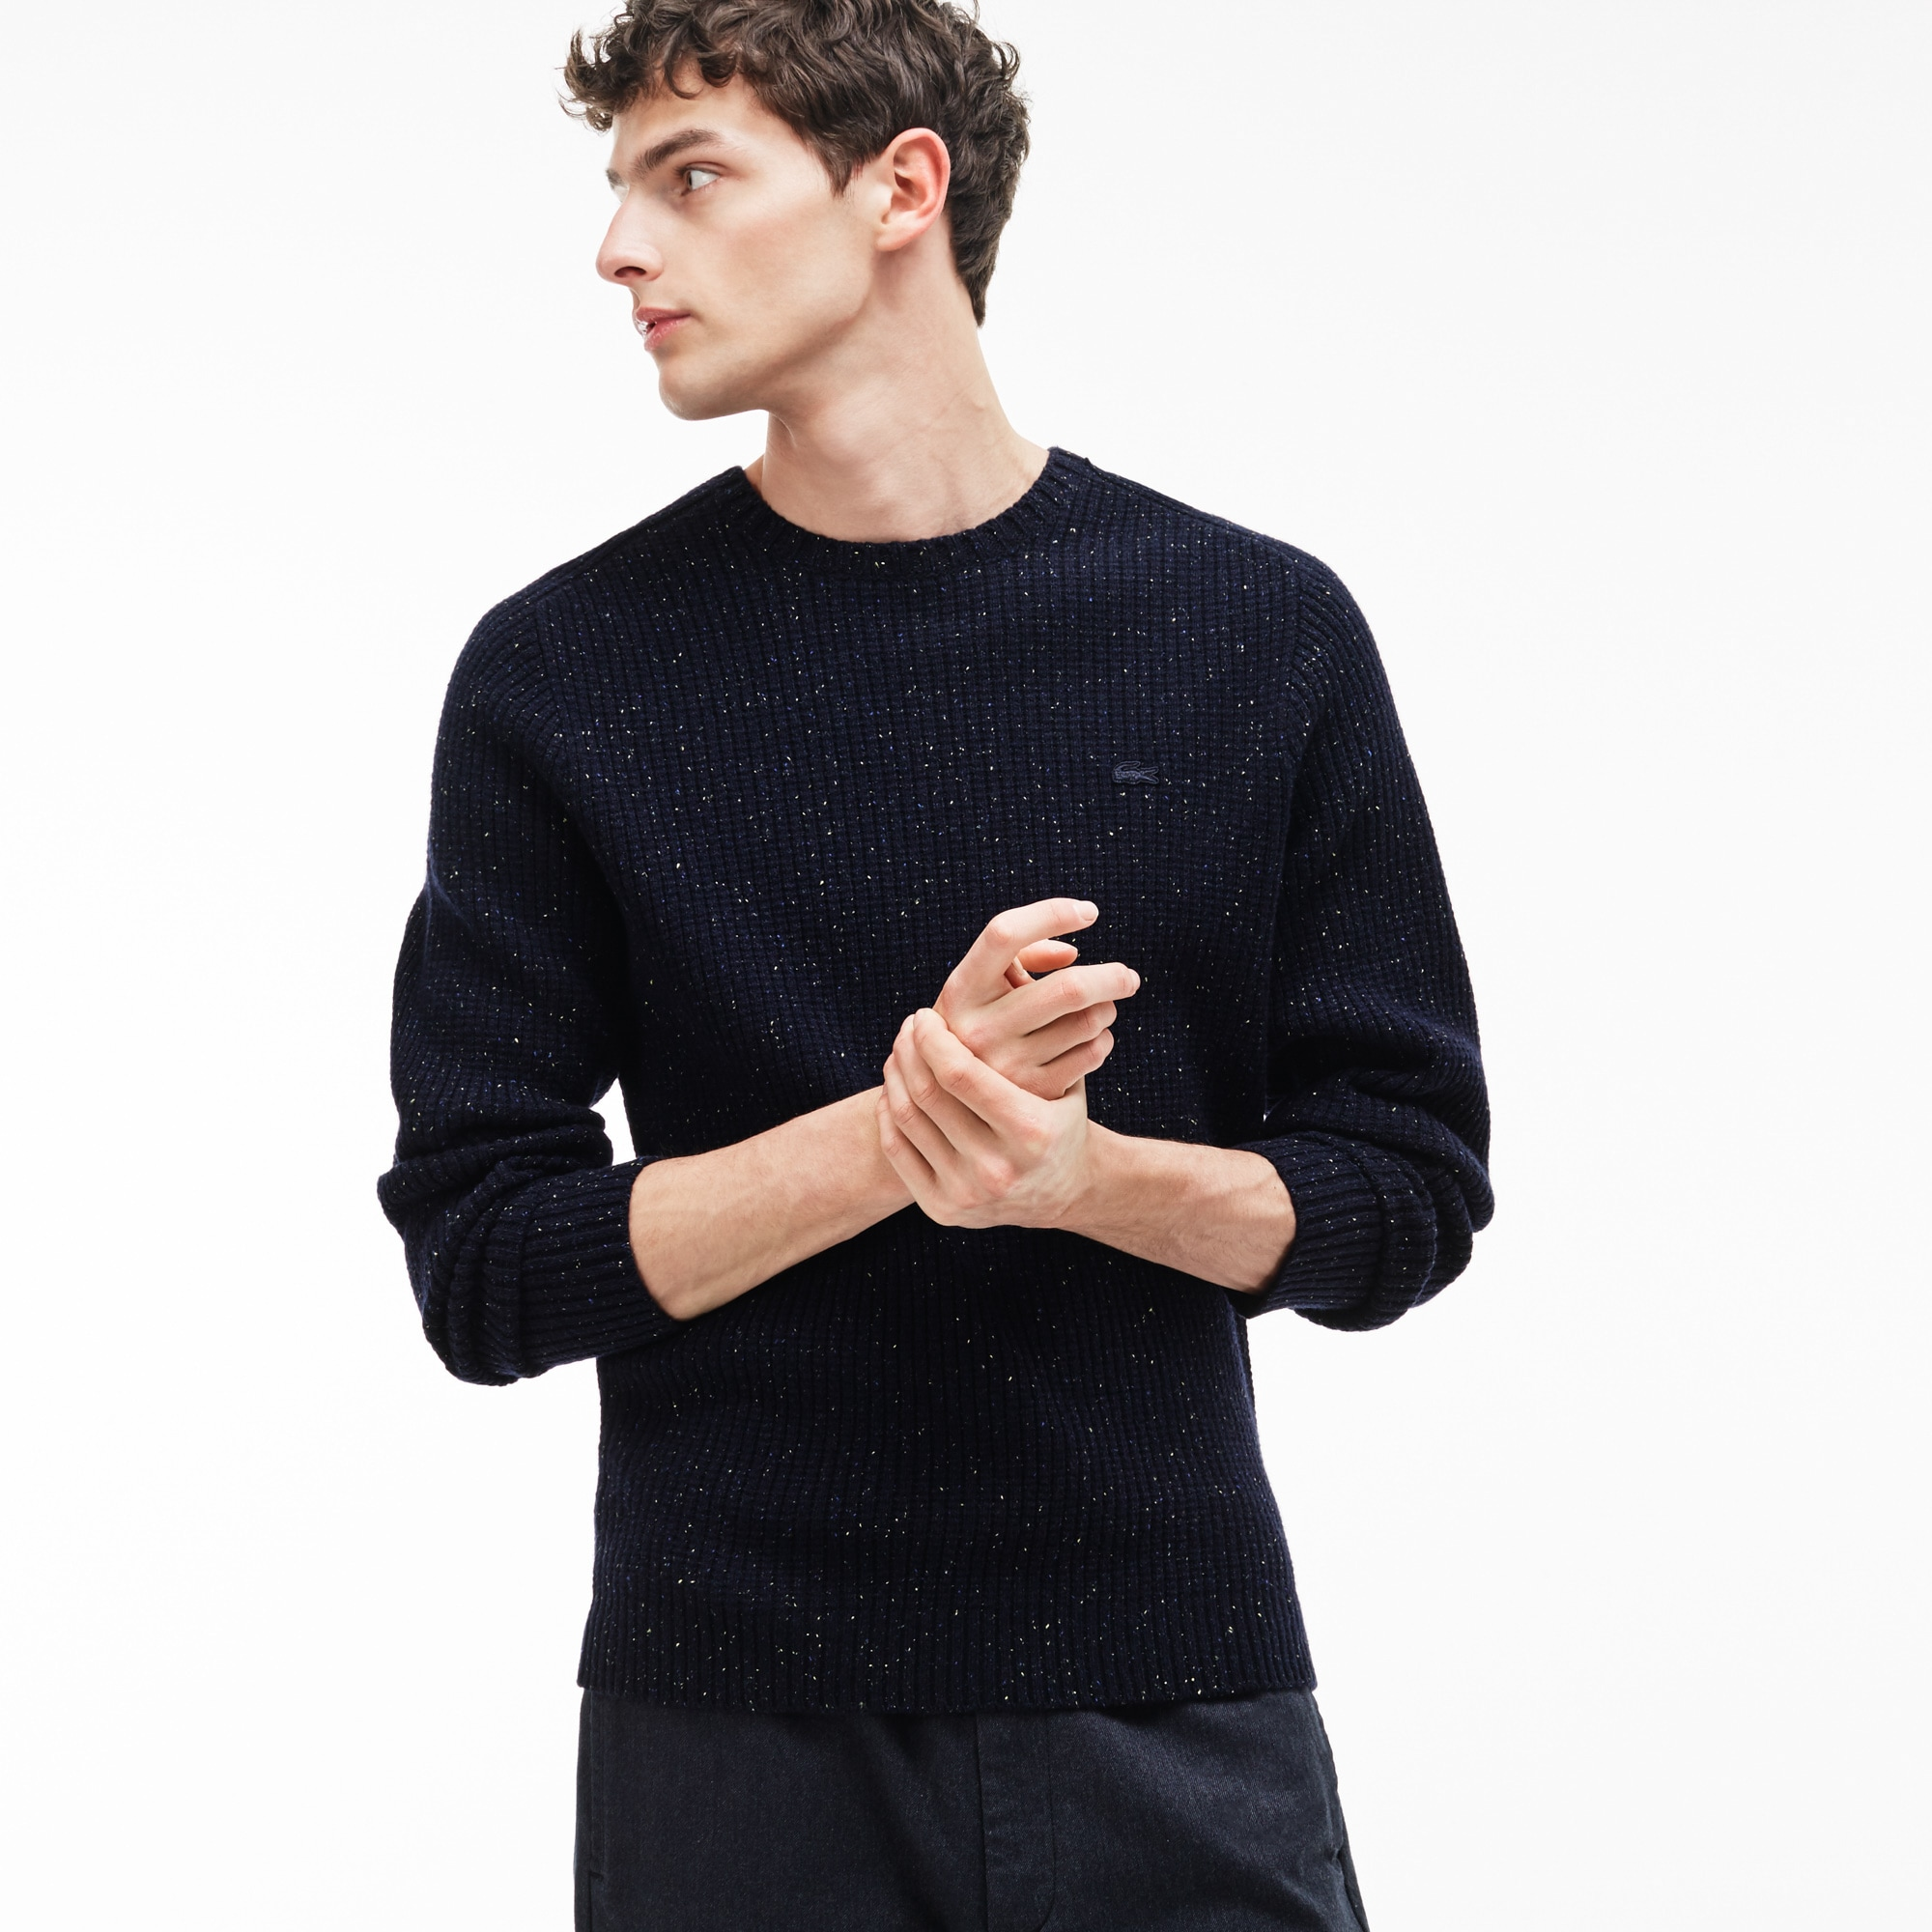 Mens Crew Neck Two Tone Polka Dot Waffle Stitch Wool Sweater Lacoste